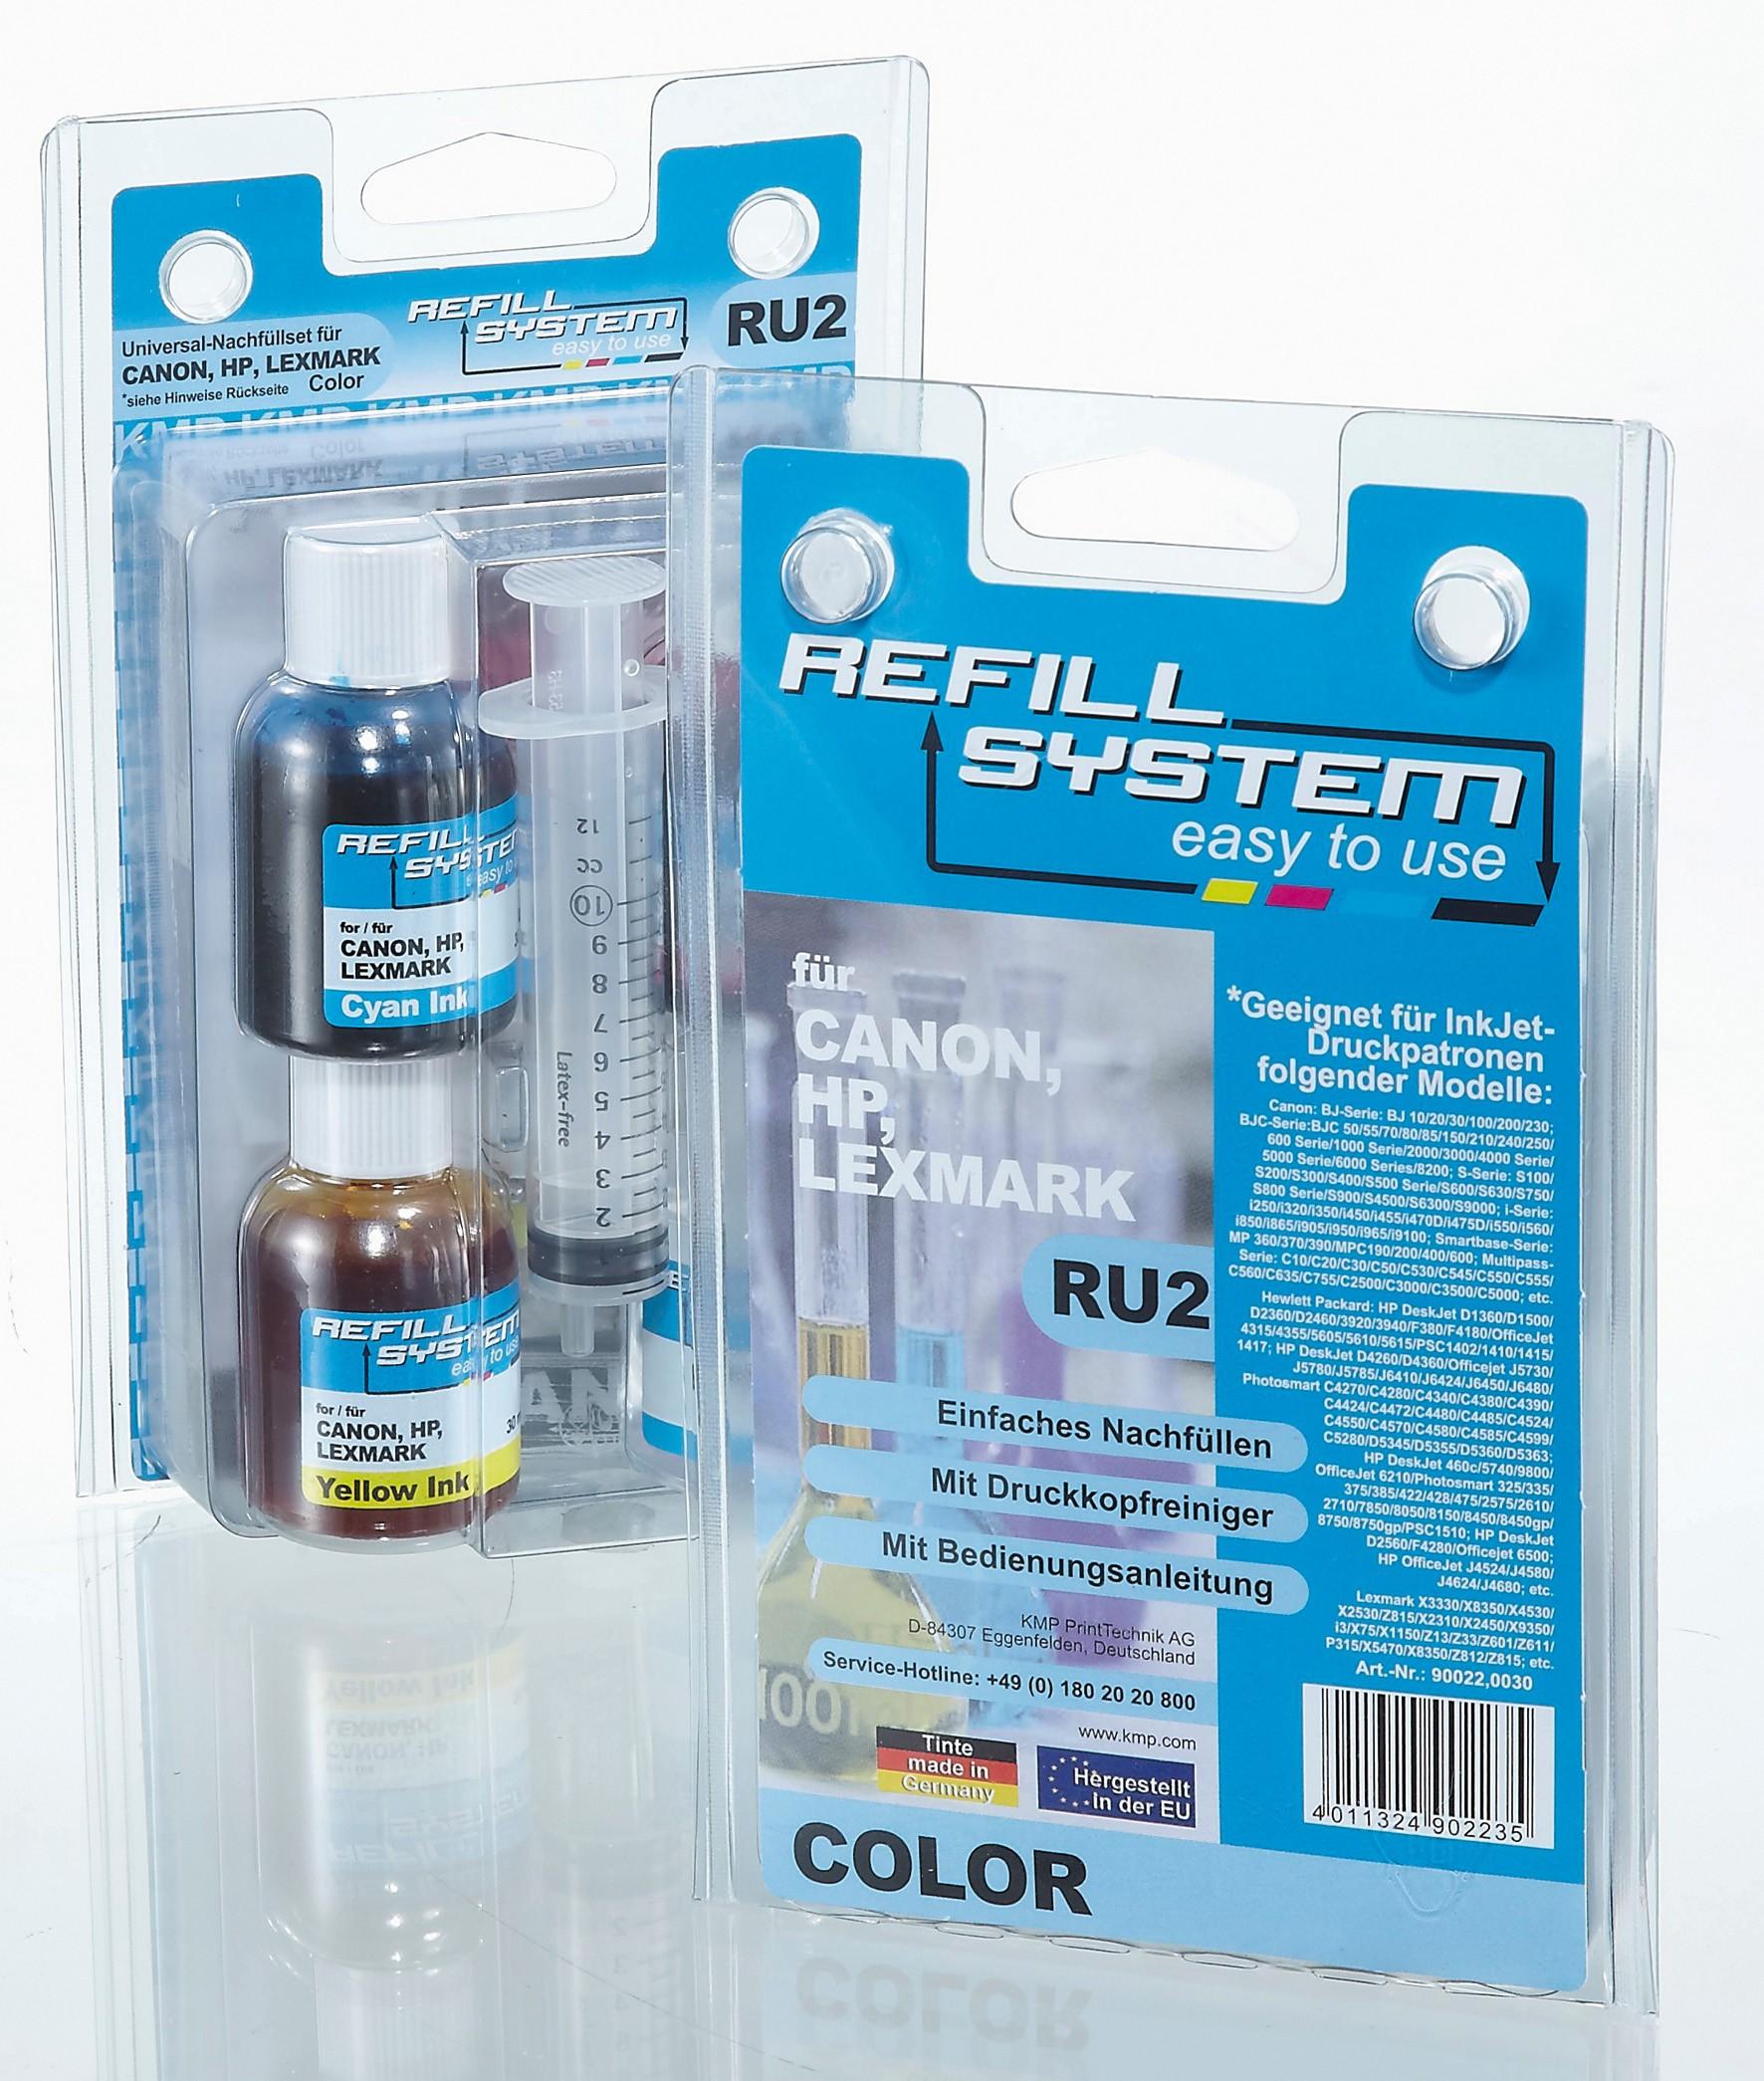 Vorschau: KMP Refill-System RH3 für HP color